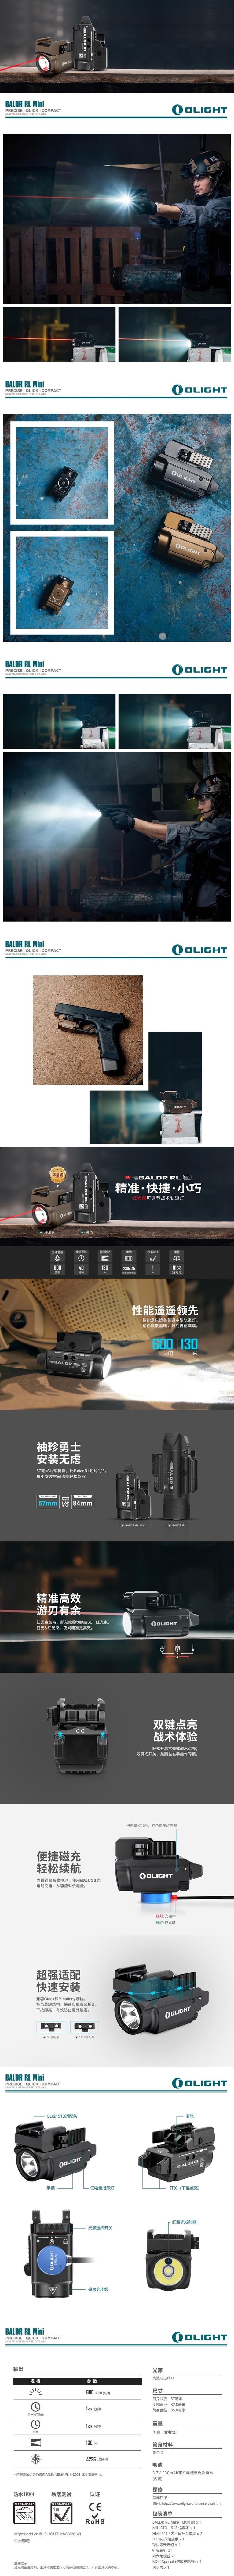 錸特光電】OLIGHT BALDR RL MINI 紅雷射 600流明 快拆 槍燈 Glock Picatinny Pic rail (1)